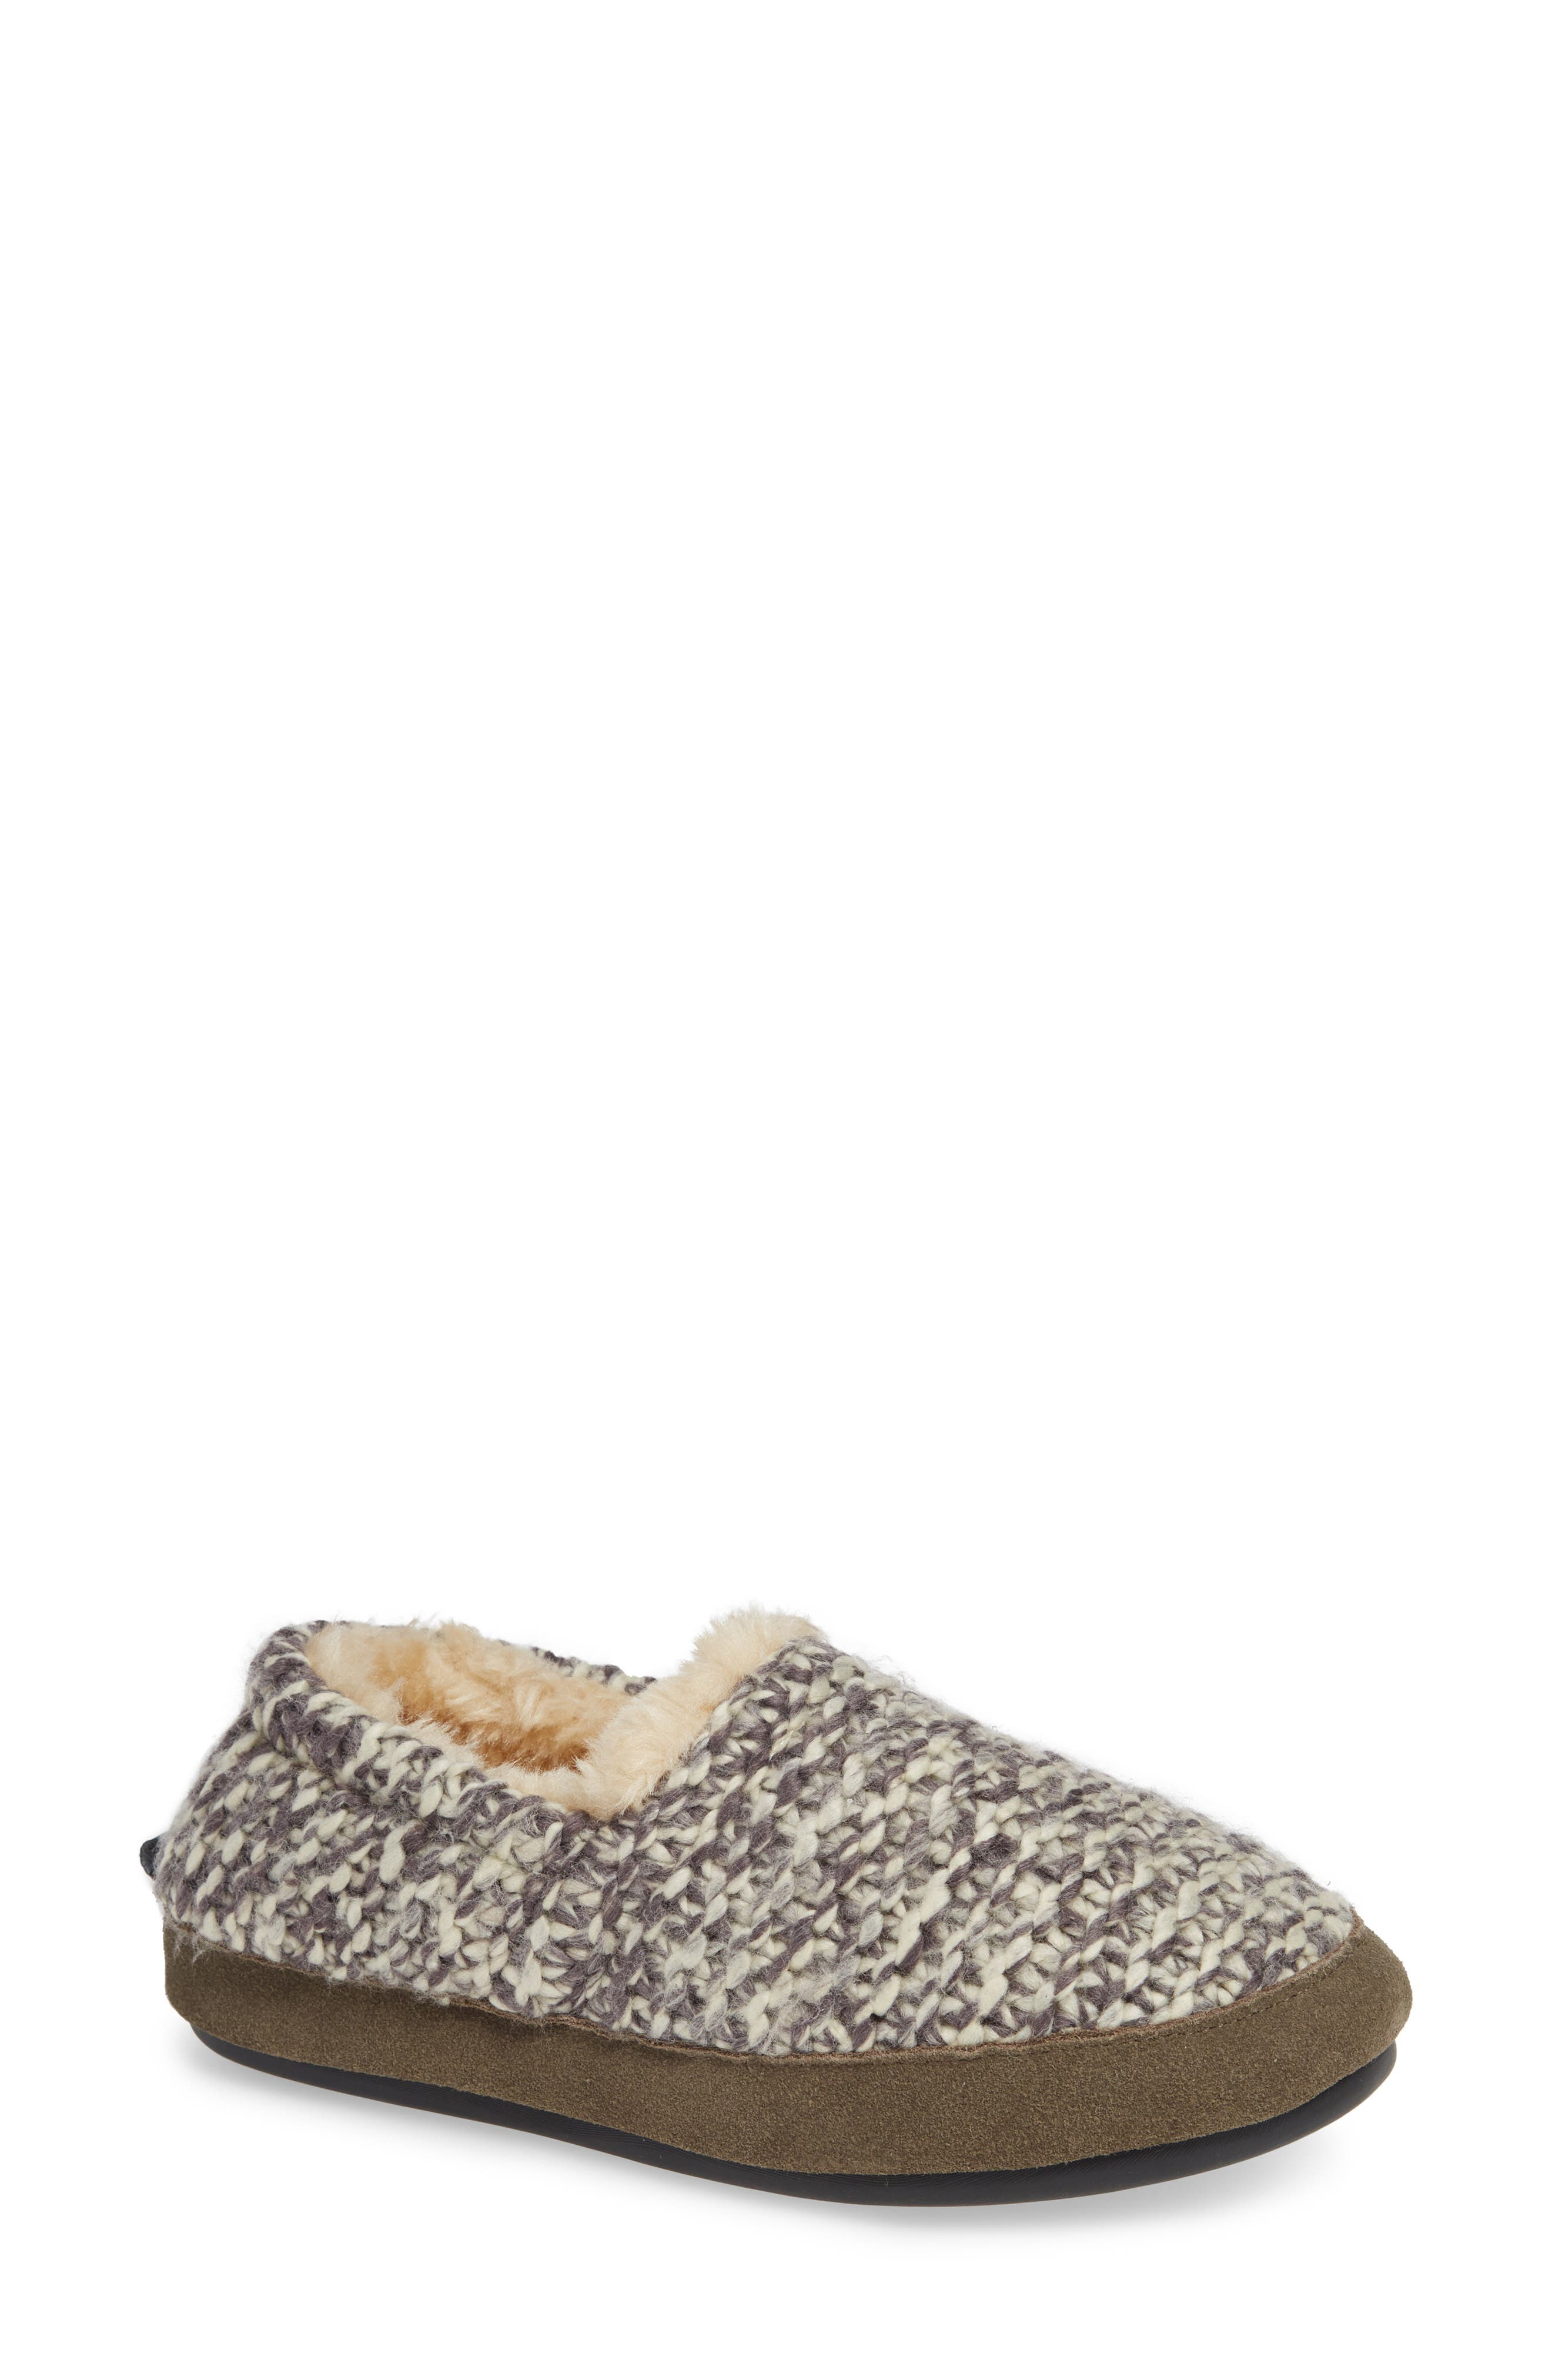 Whitecap Knit Slipper,                         Main,                         color, WARM NEUTRAL FABRIC